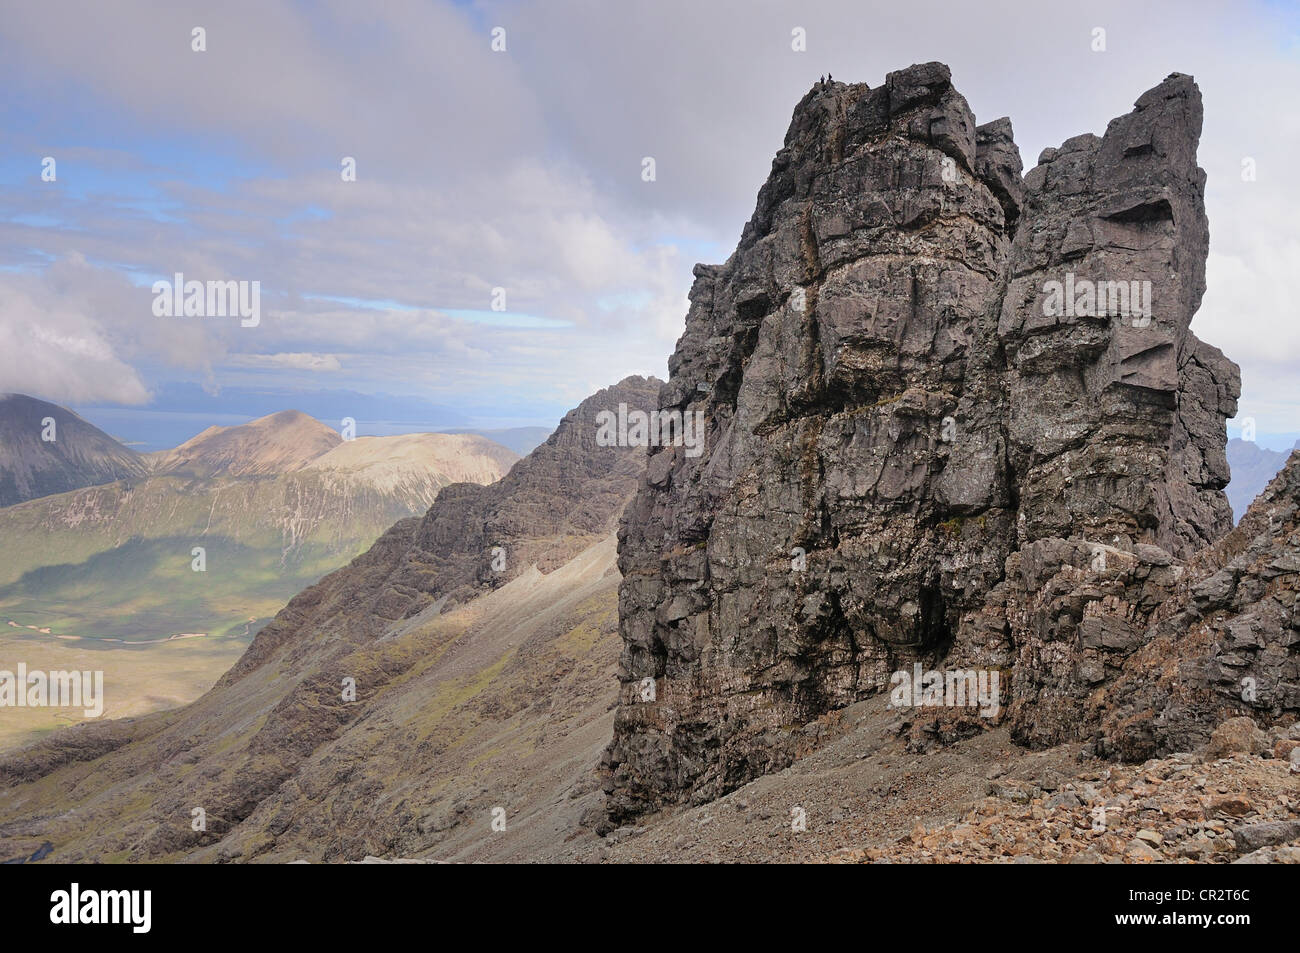 Climbers on the summit of Am Basteir, Black Cuillin, Isle of Skye, Scotland - Stock Image